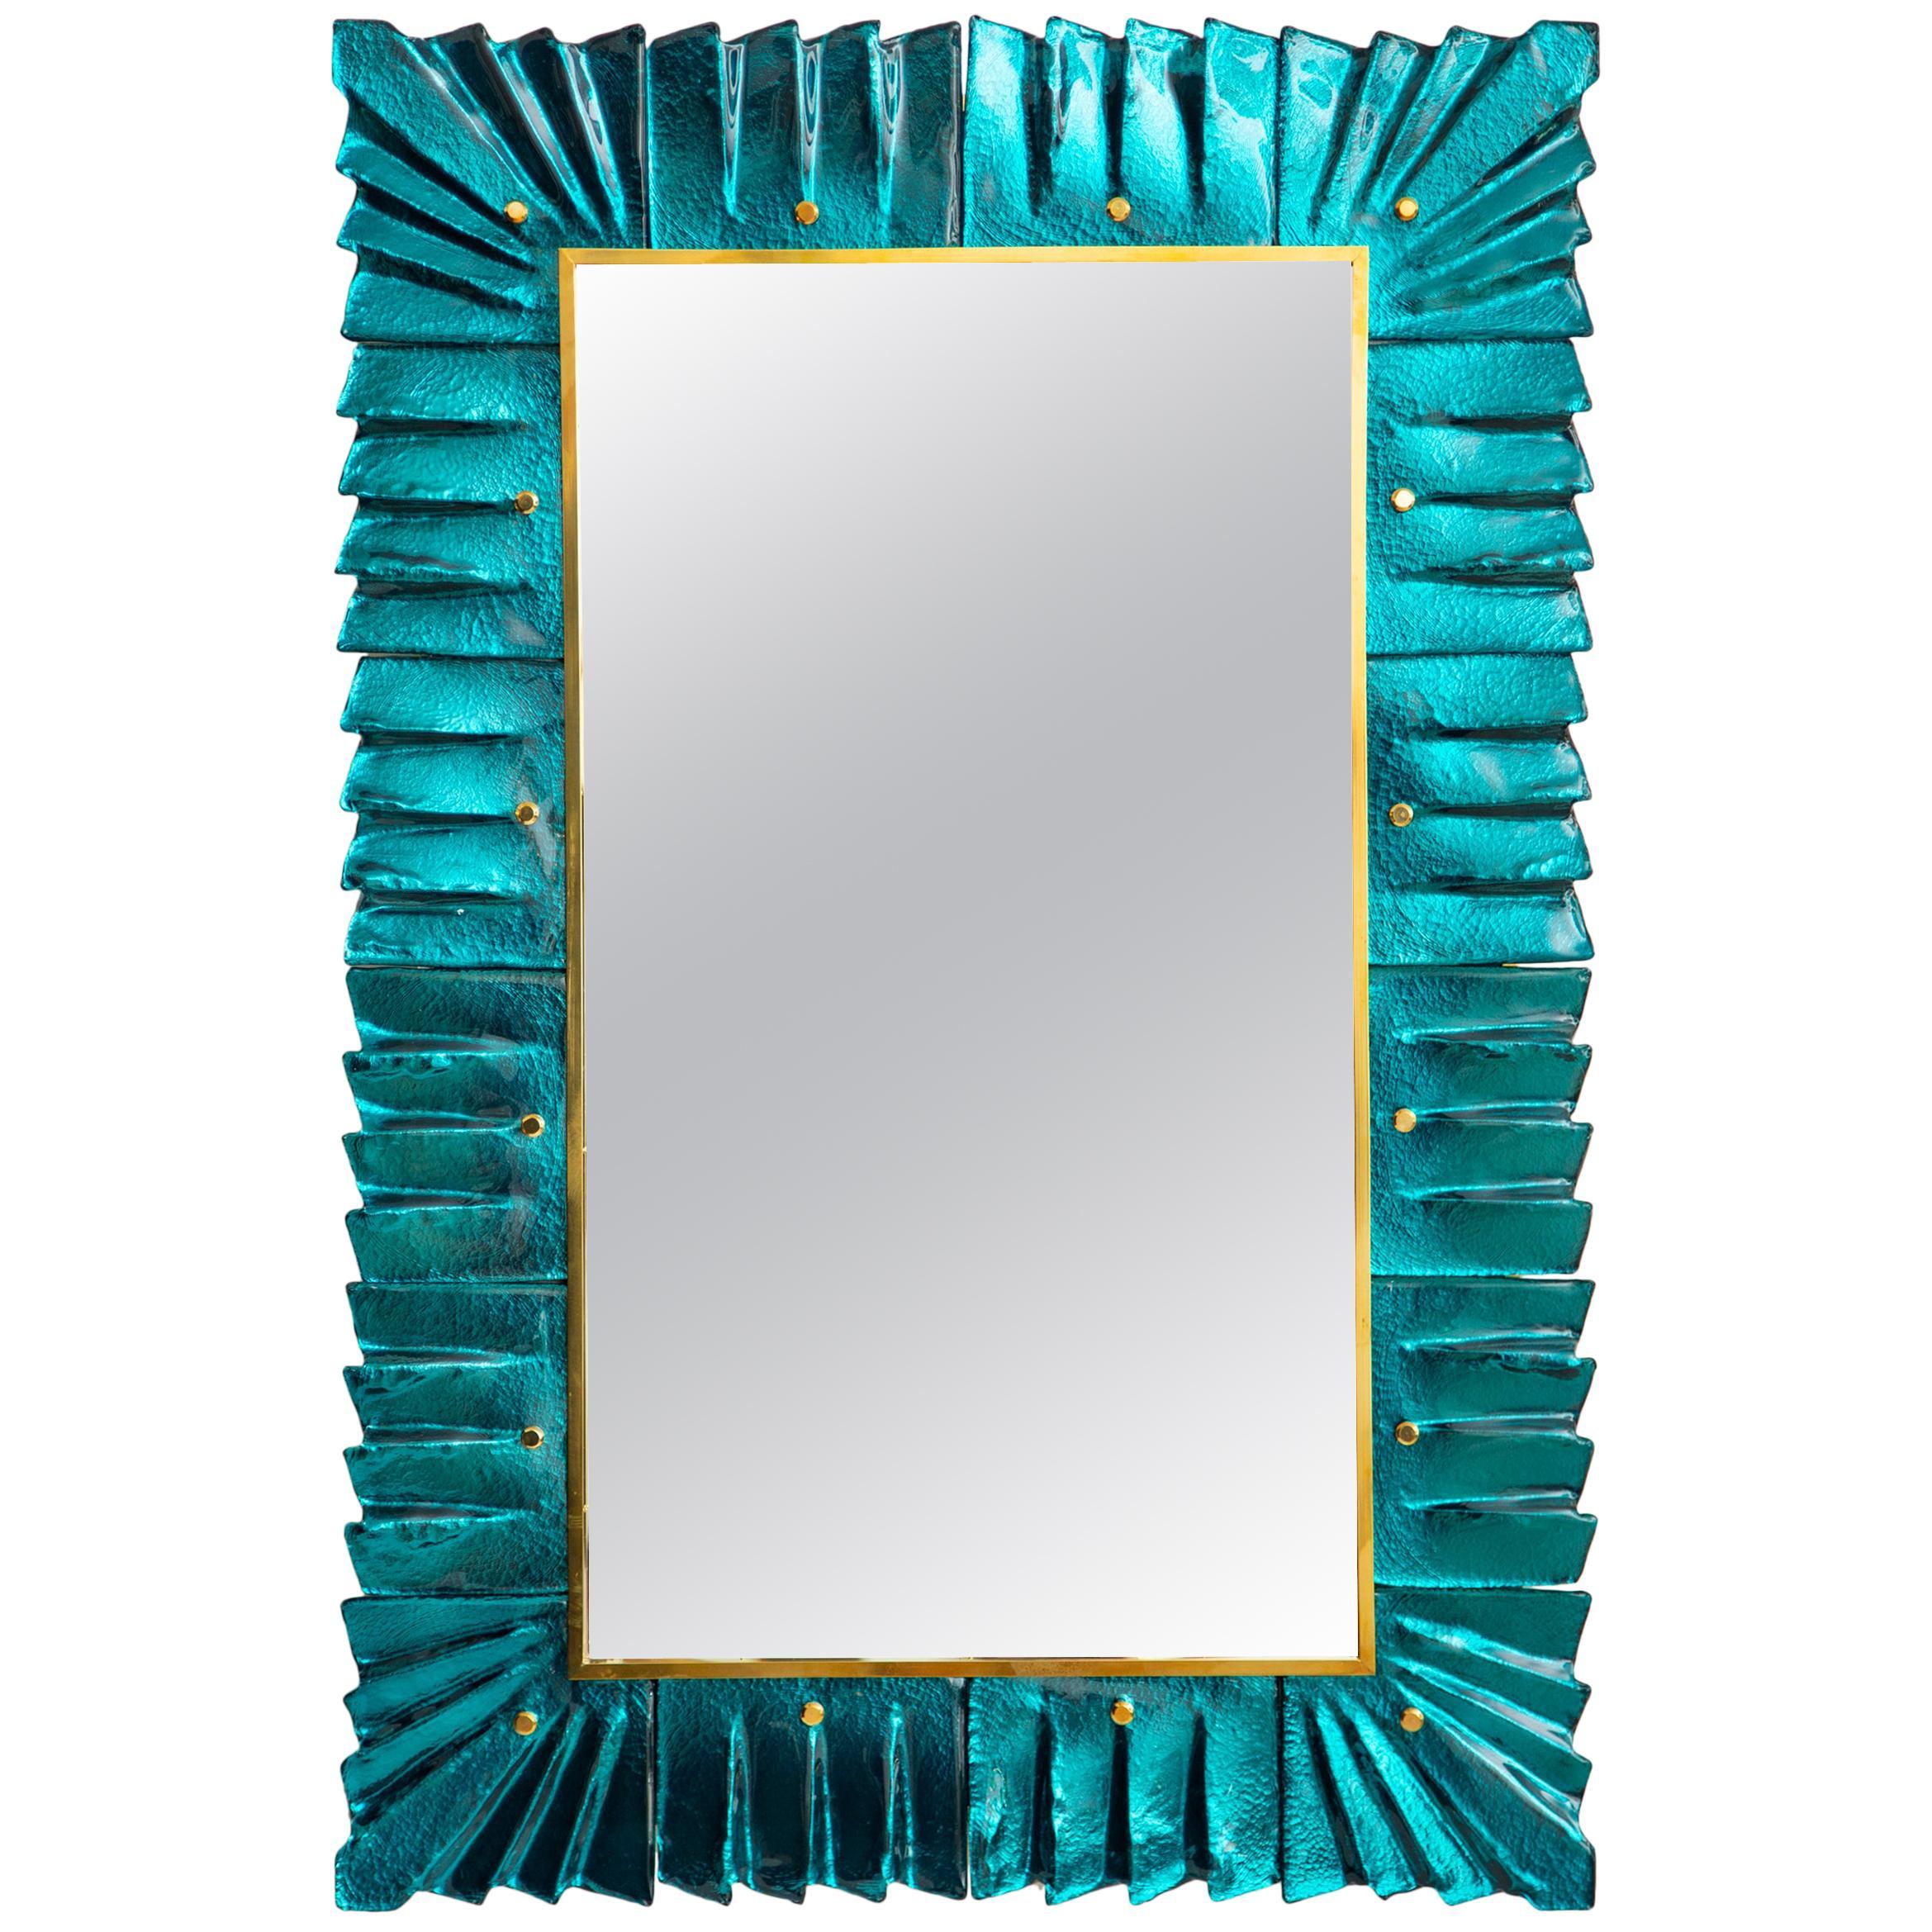 Murano Aquamarine Glass Framed Mirror, in Stock